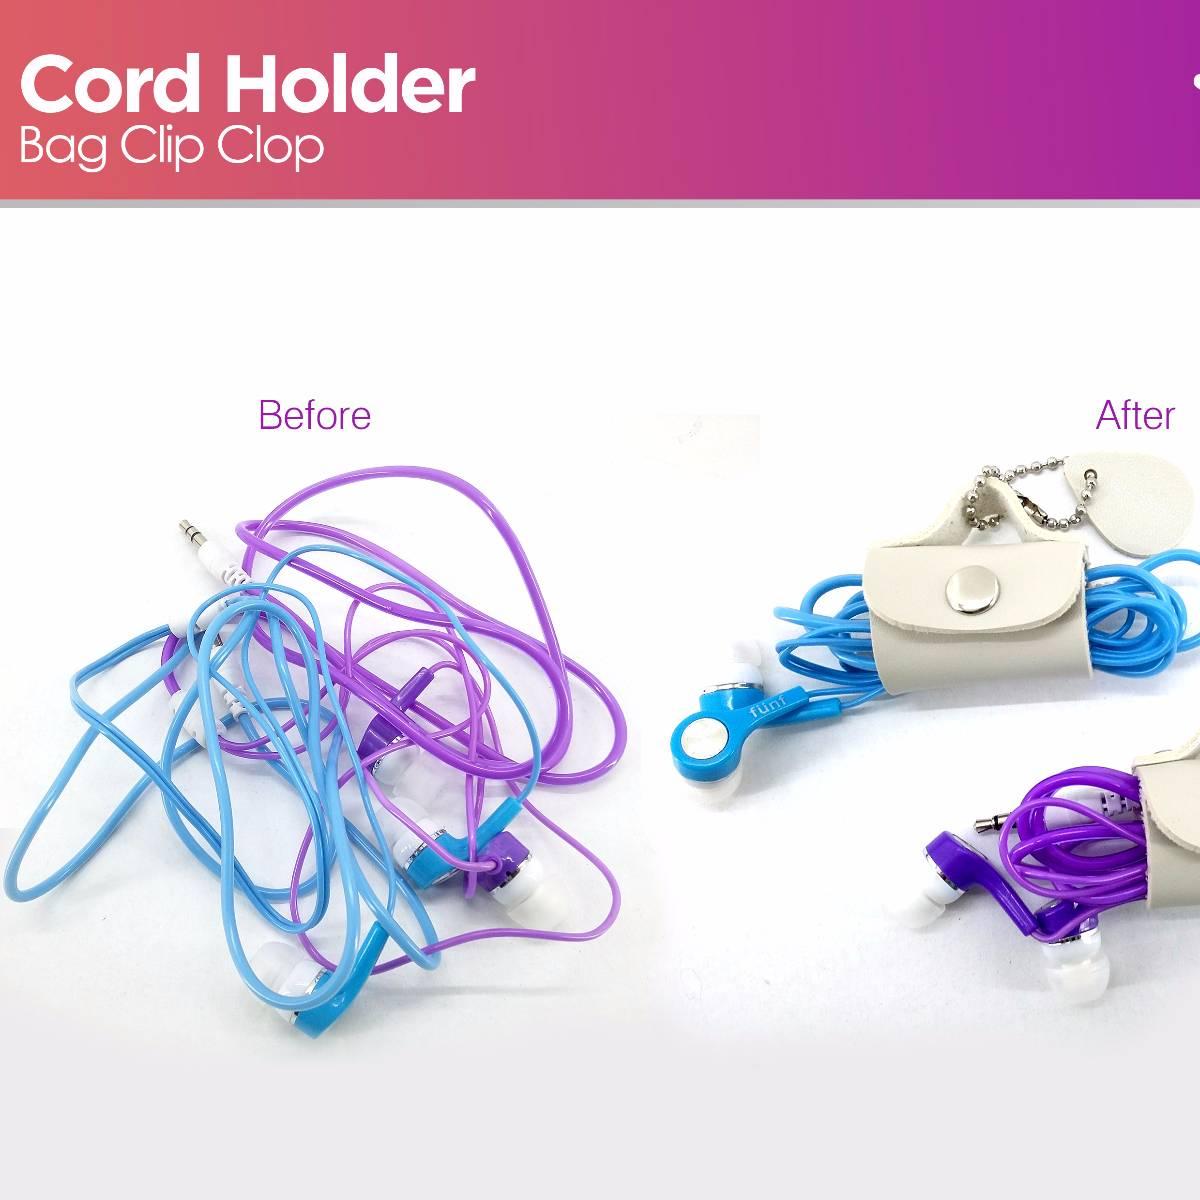 Cord Holder Bag2